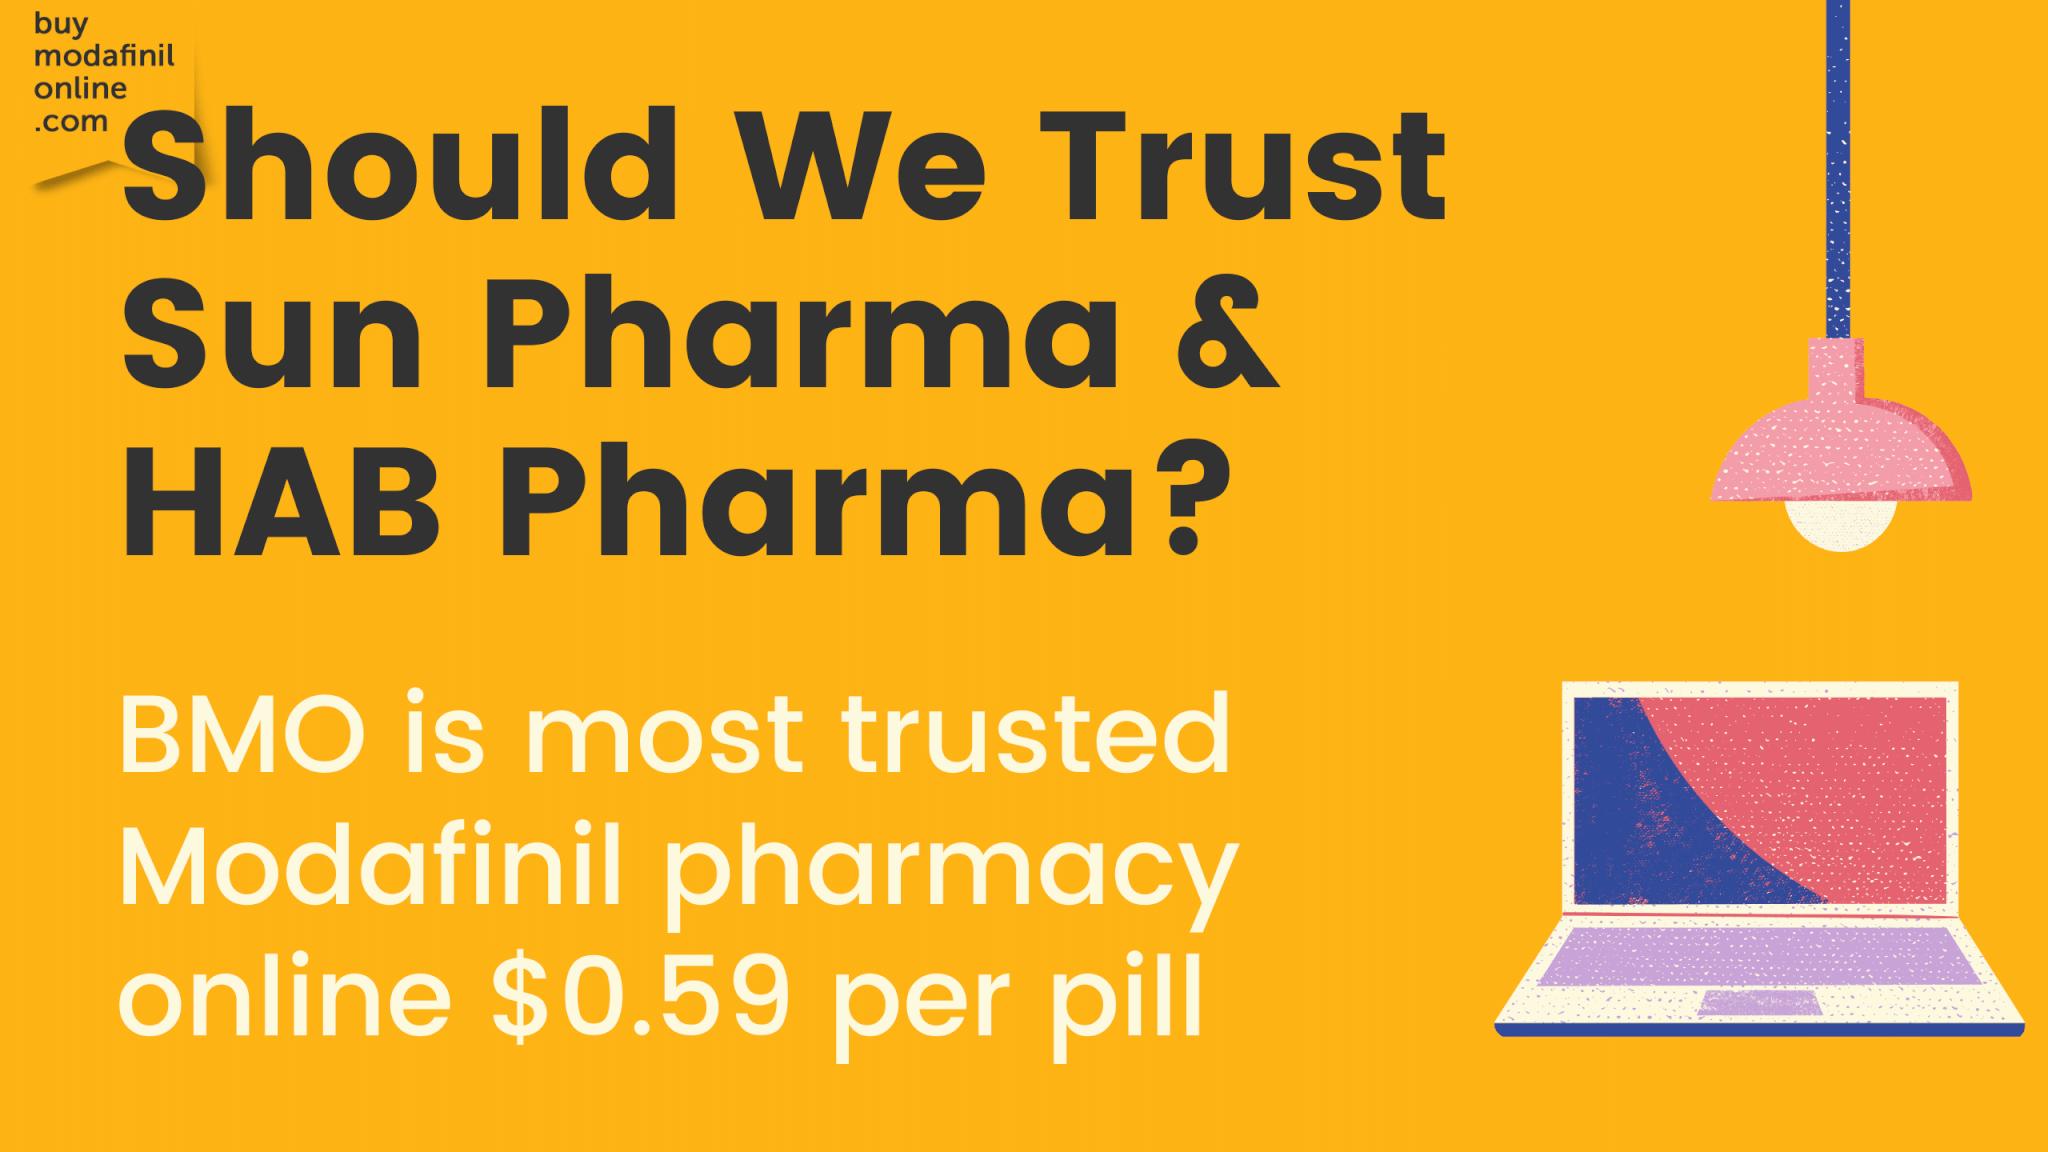 Sun Pharma and HAB Pharma: Why Can We Trust Them